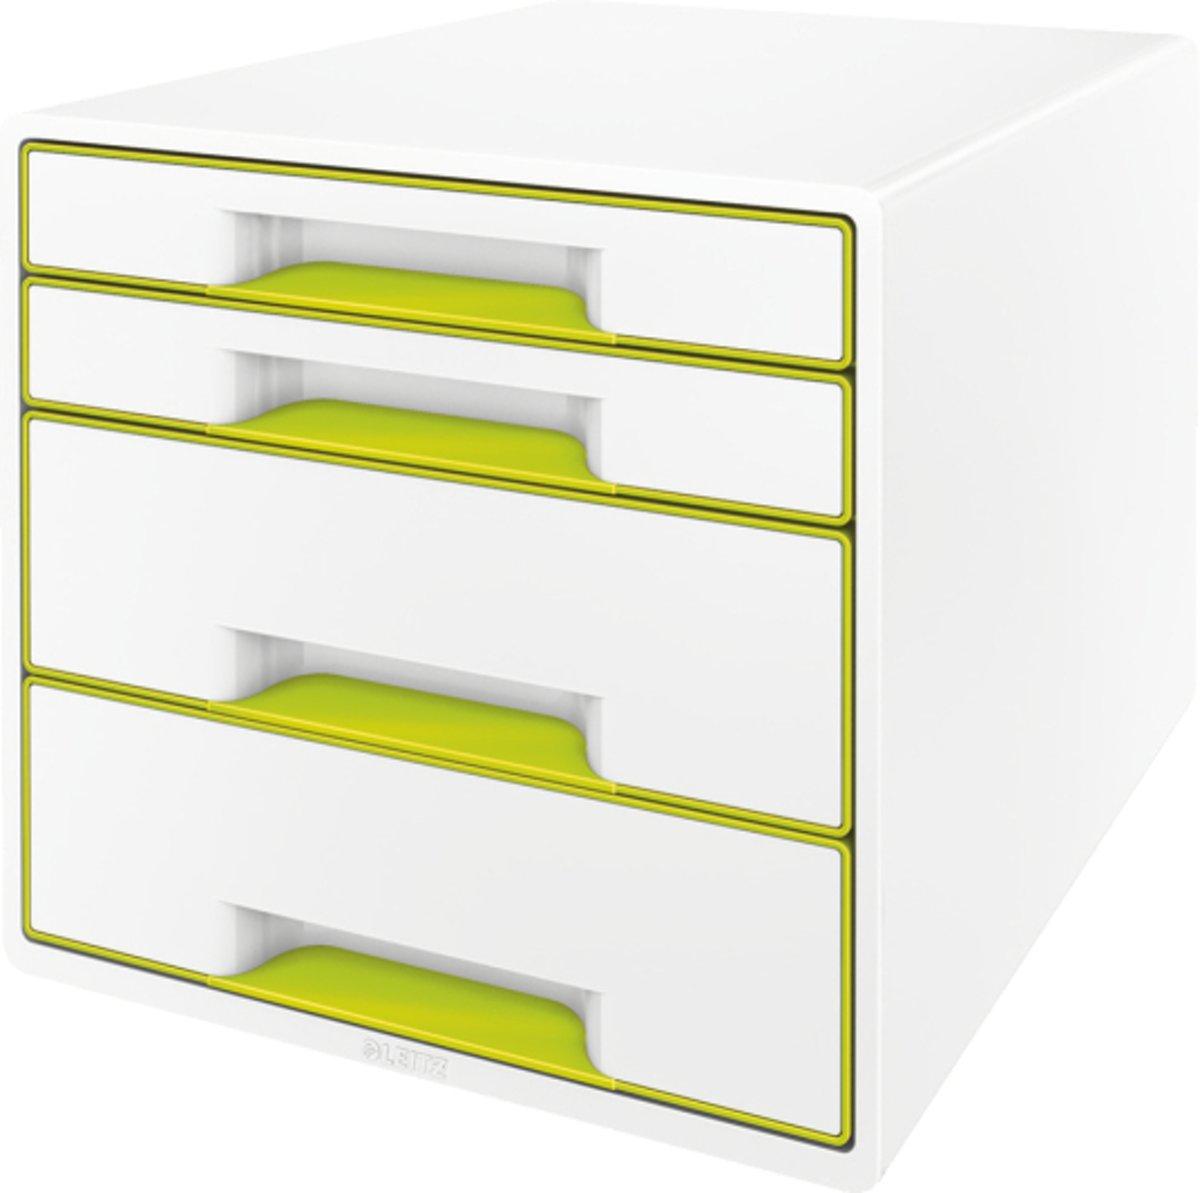 HAN Ladebox IMPULS 2.0 1012-13 Zwart DIN A4, DIN C4 Aantal lades: 4